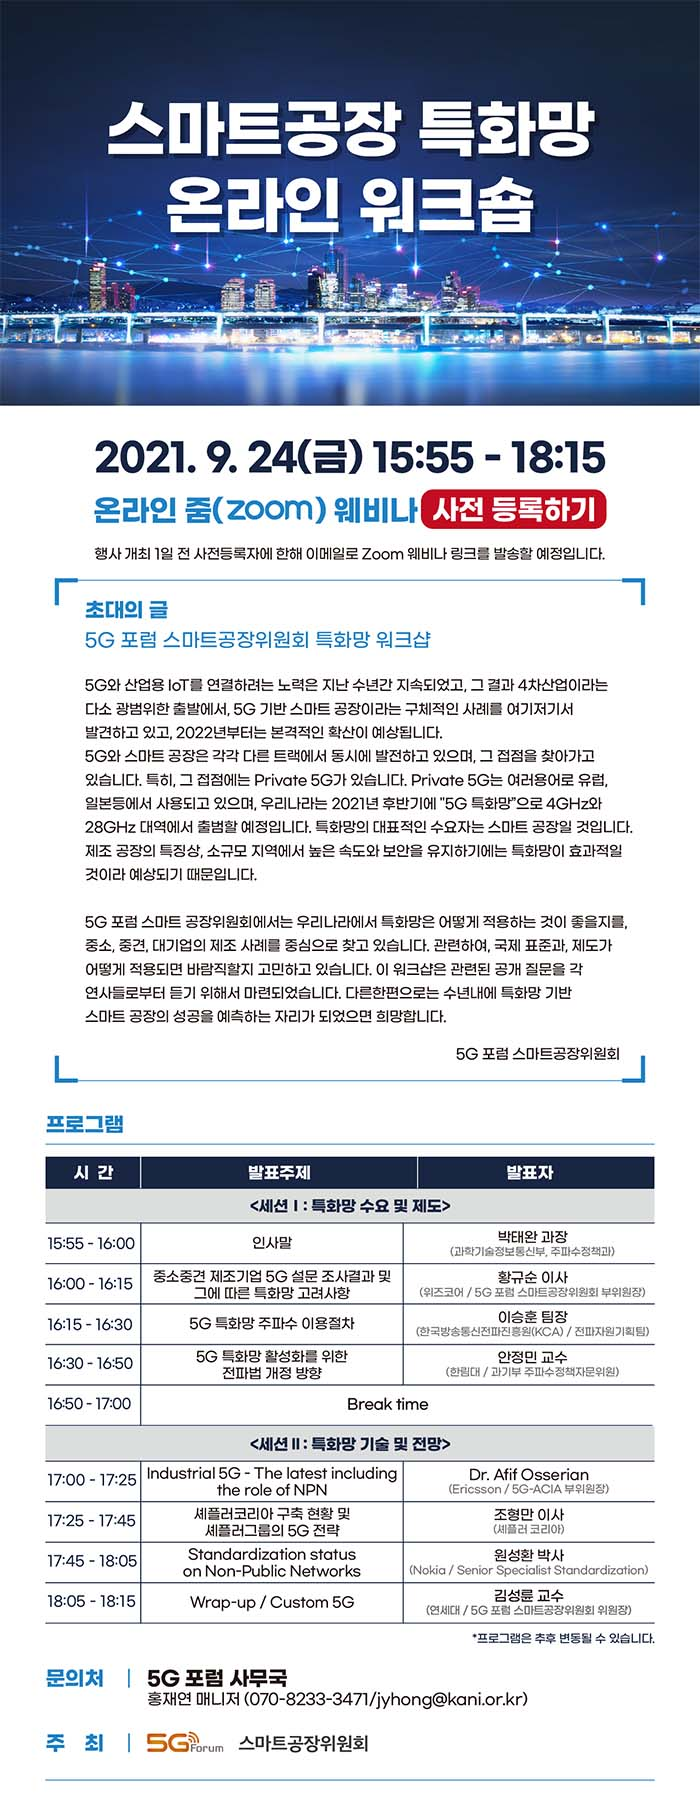 edm_5gx_forum_smartfactory_20210924.jpg?v=2